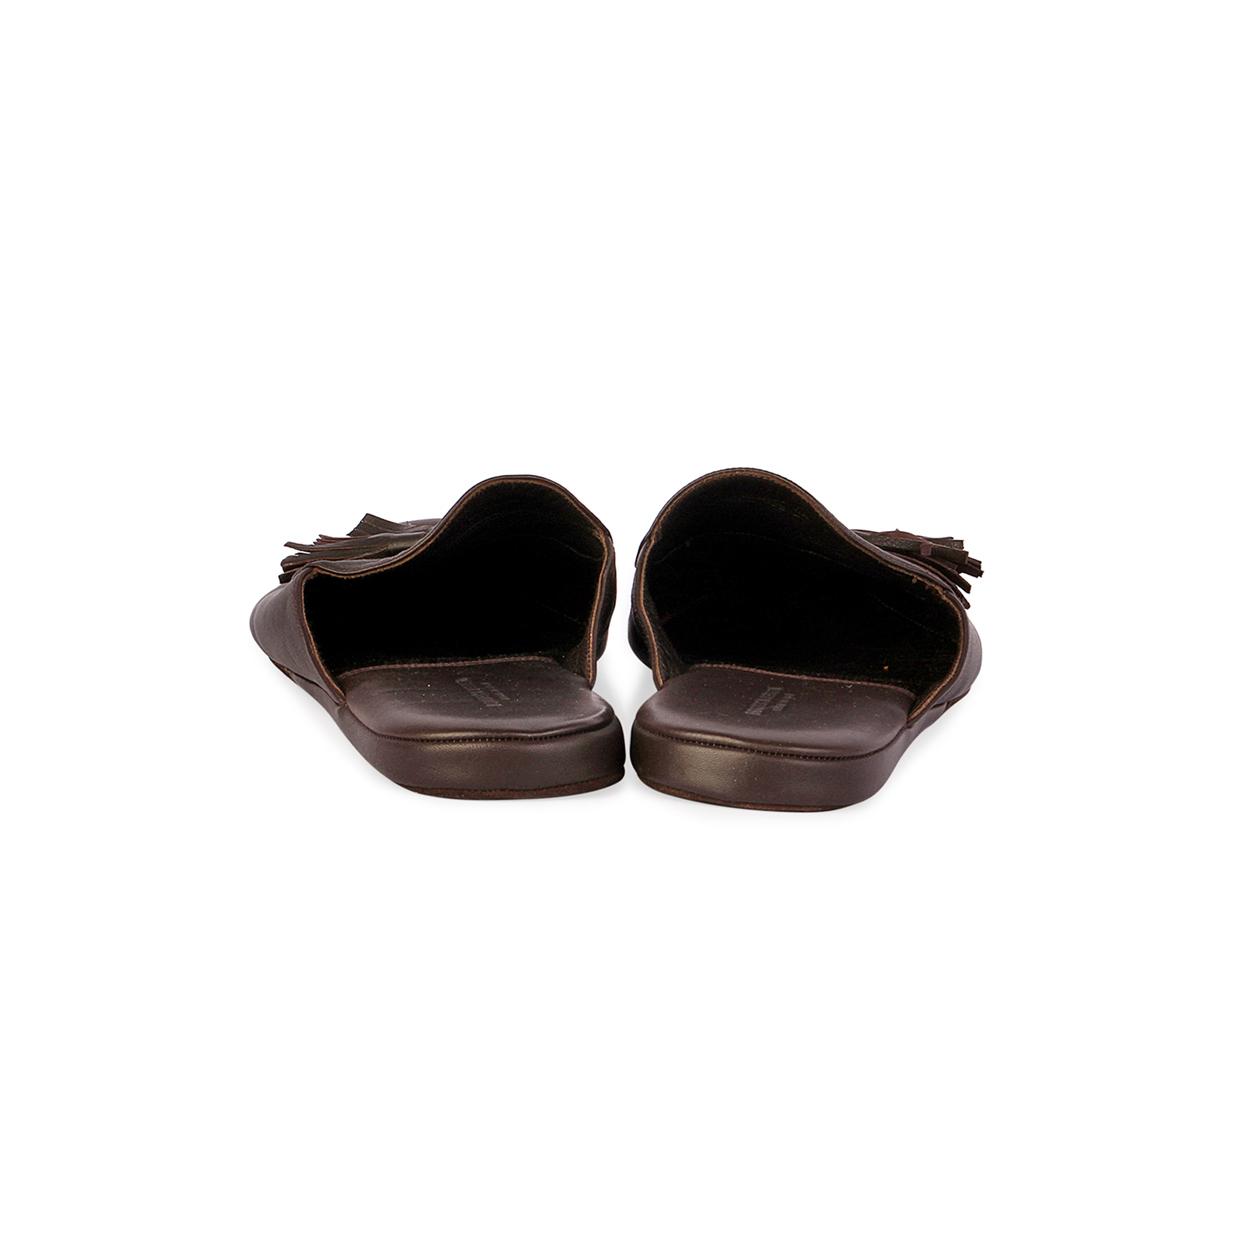 757c538d3bc9 BOTTEGA VENETA Intrecciato Leather Slippers - S 44 (9.5)-back